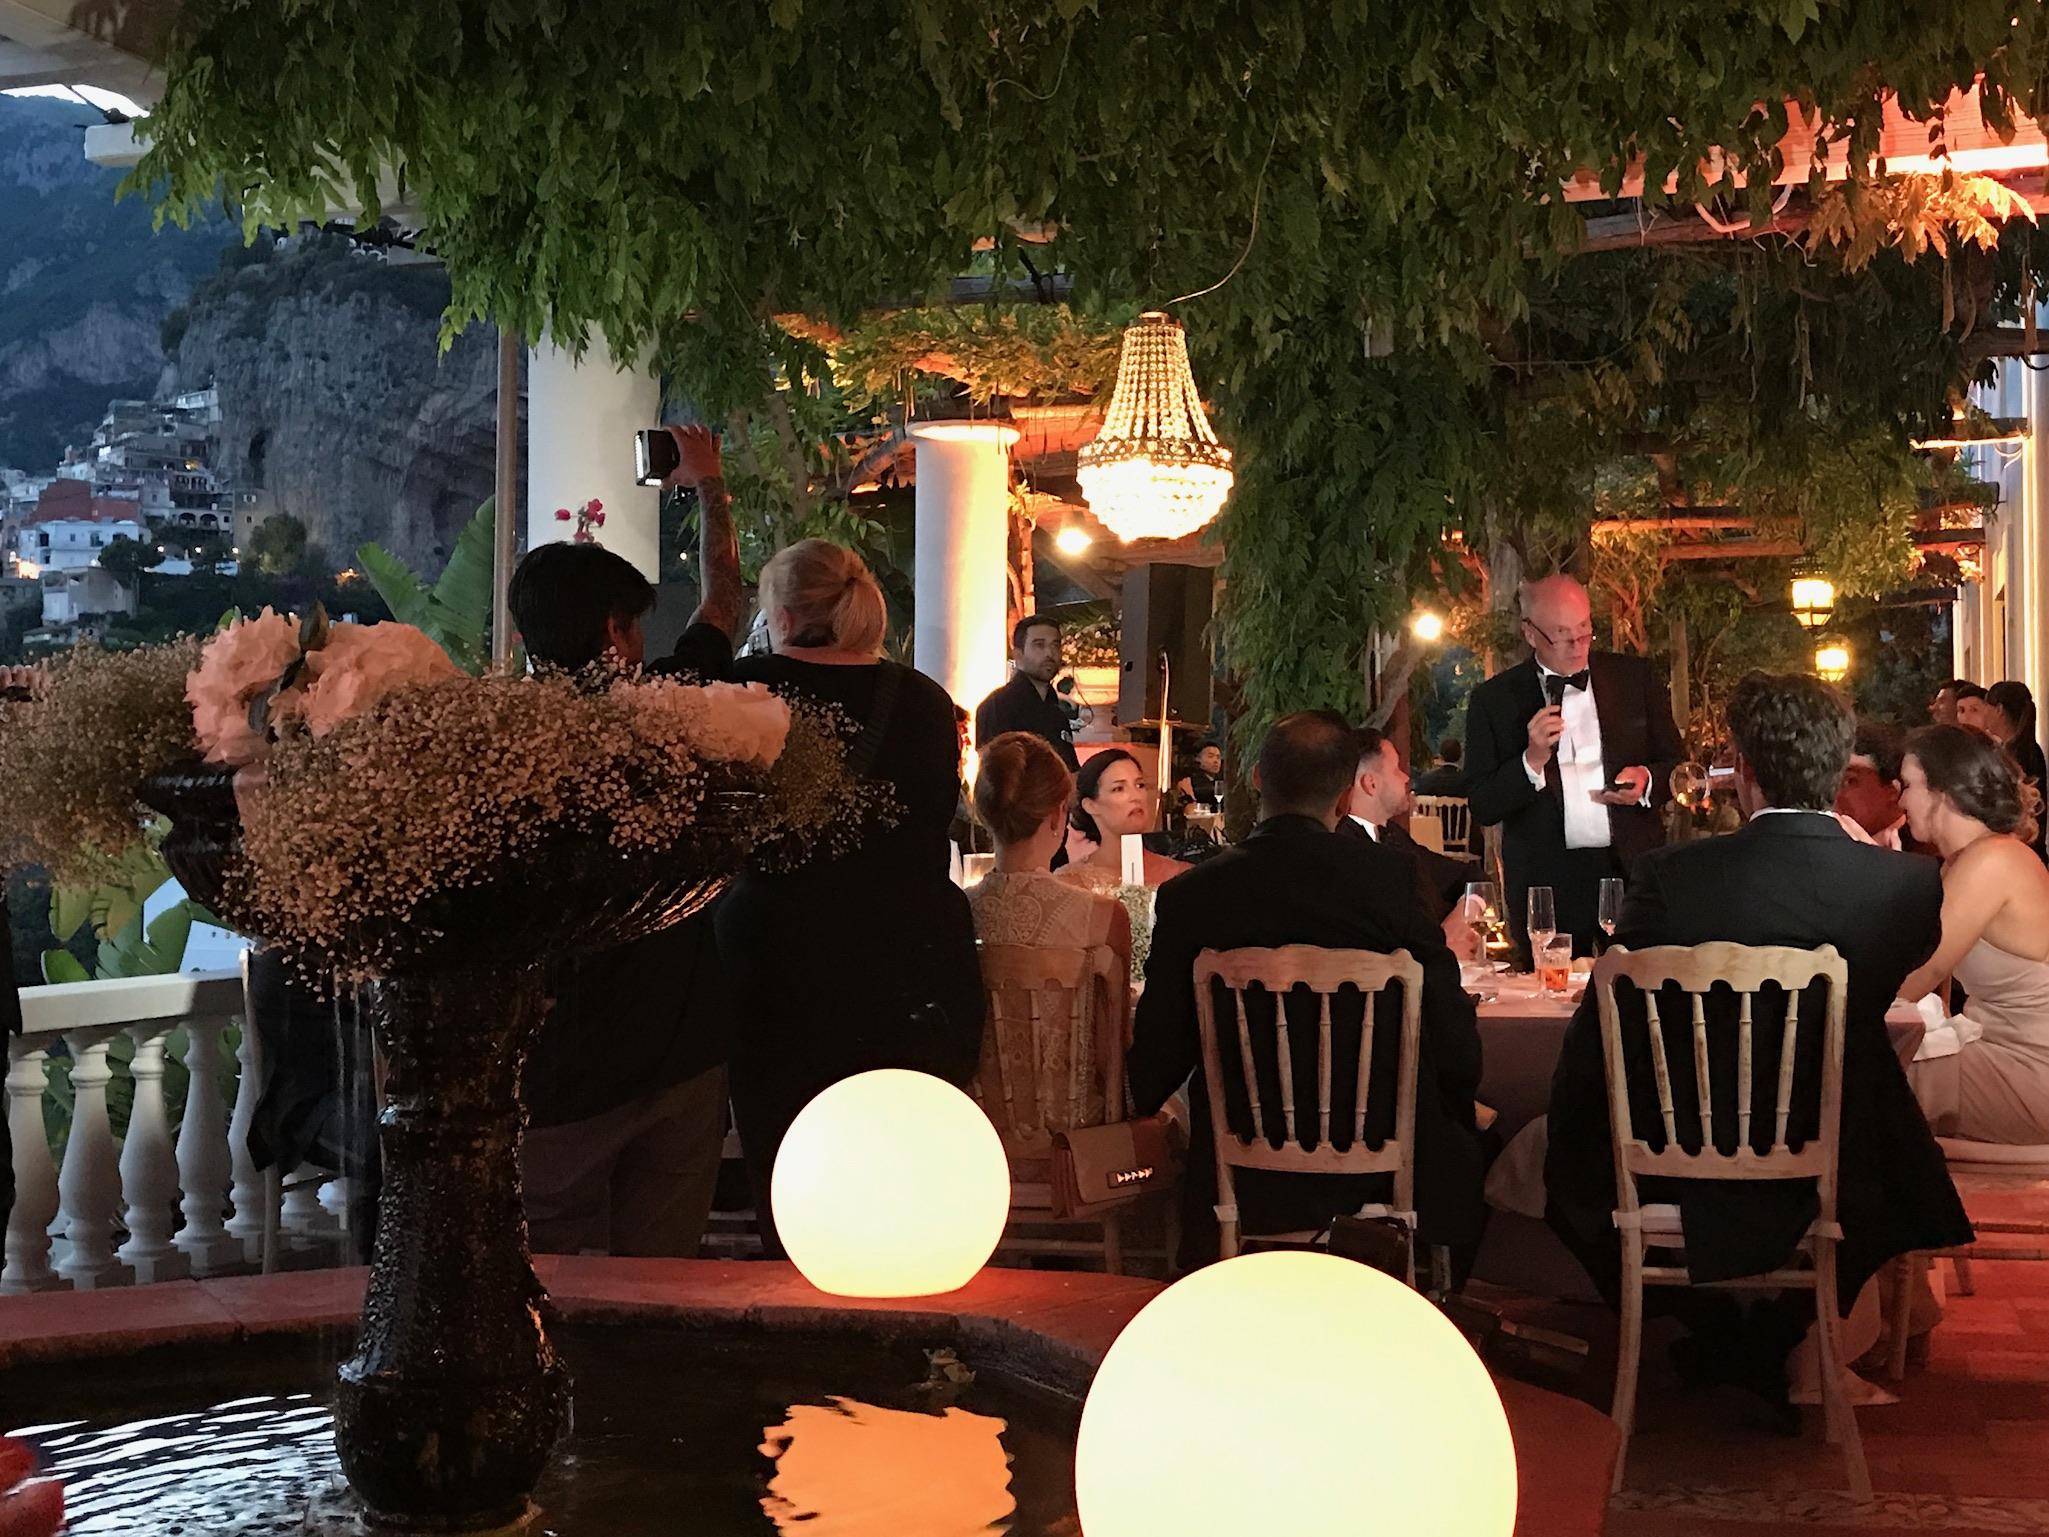 http://www.weddingamalfi.com/wp-content/uploads/Nathalie-and-Benjamin-Wedding-in-Positano-Italy-3.jpg